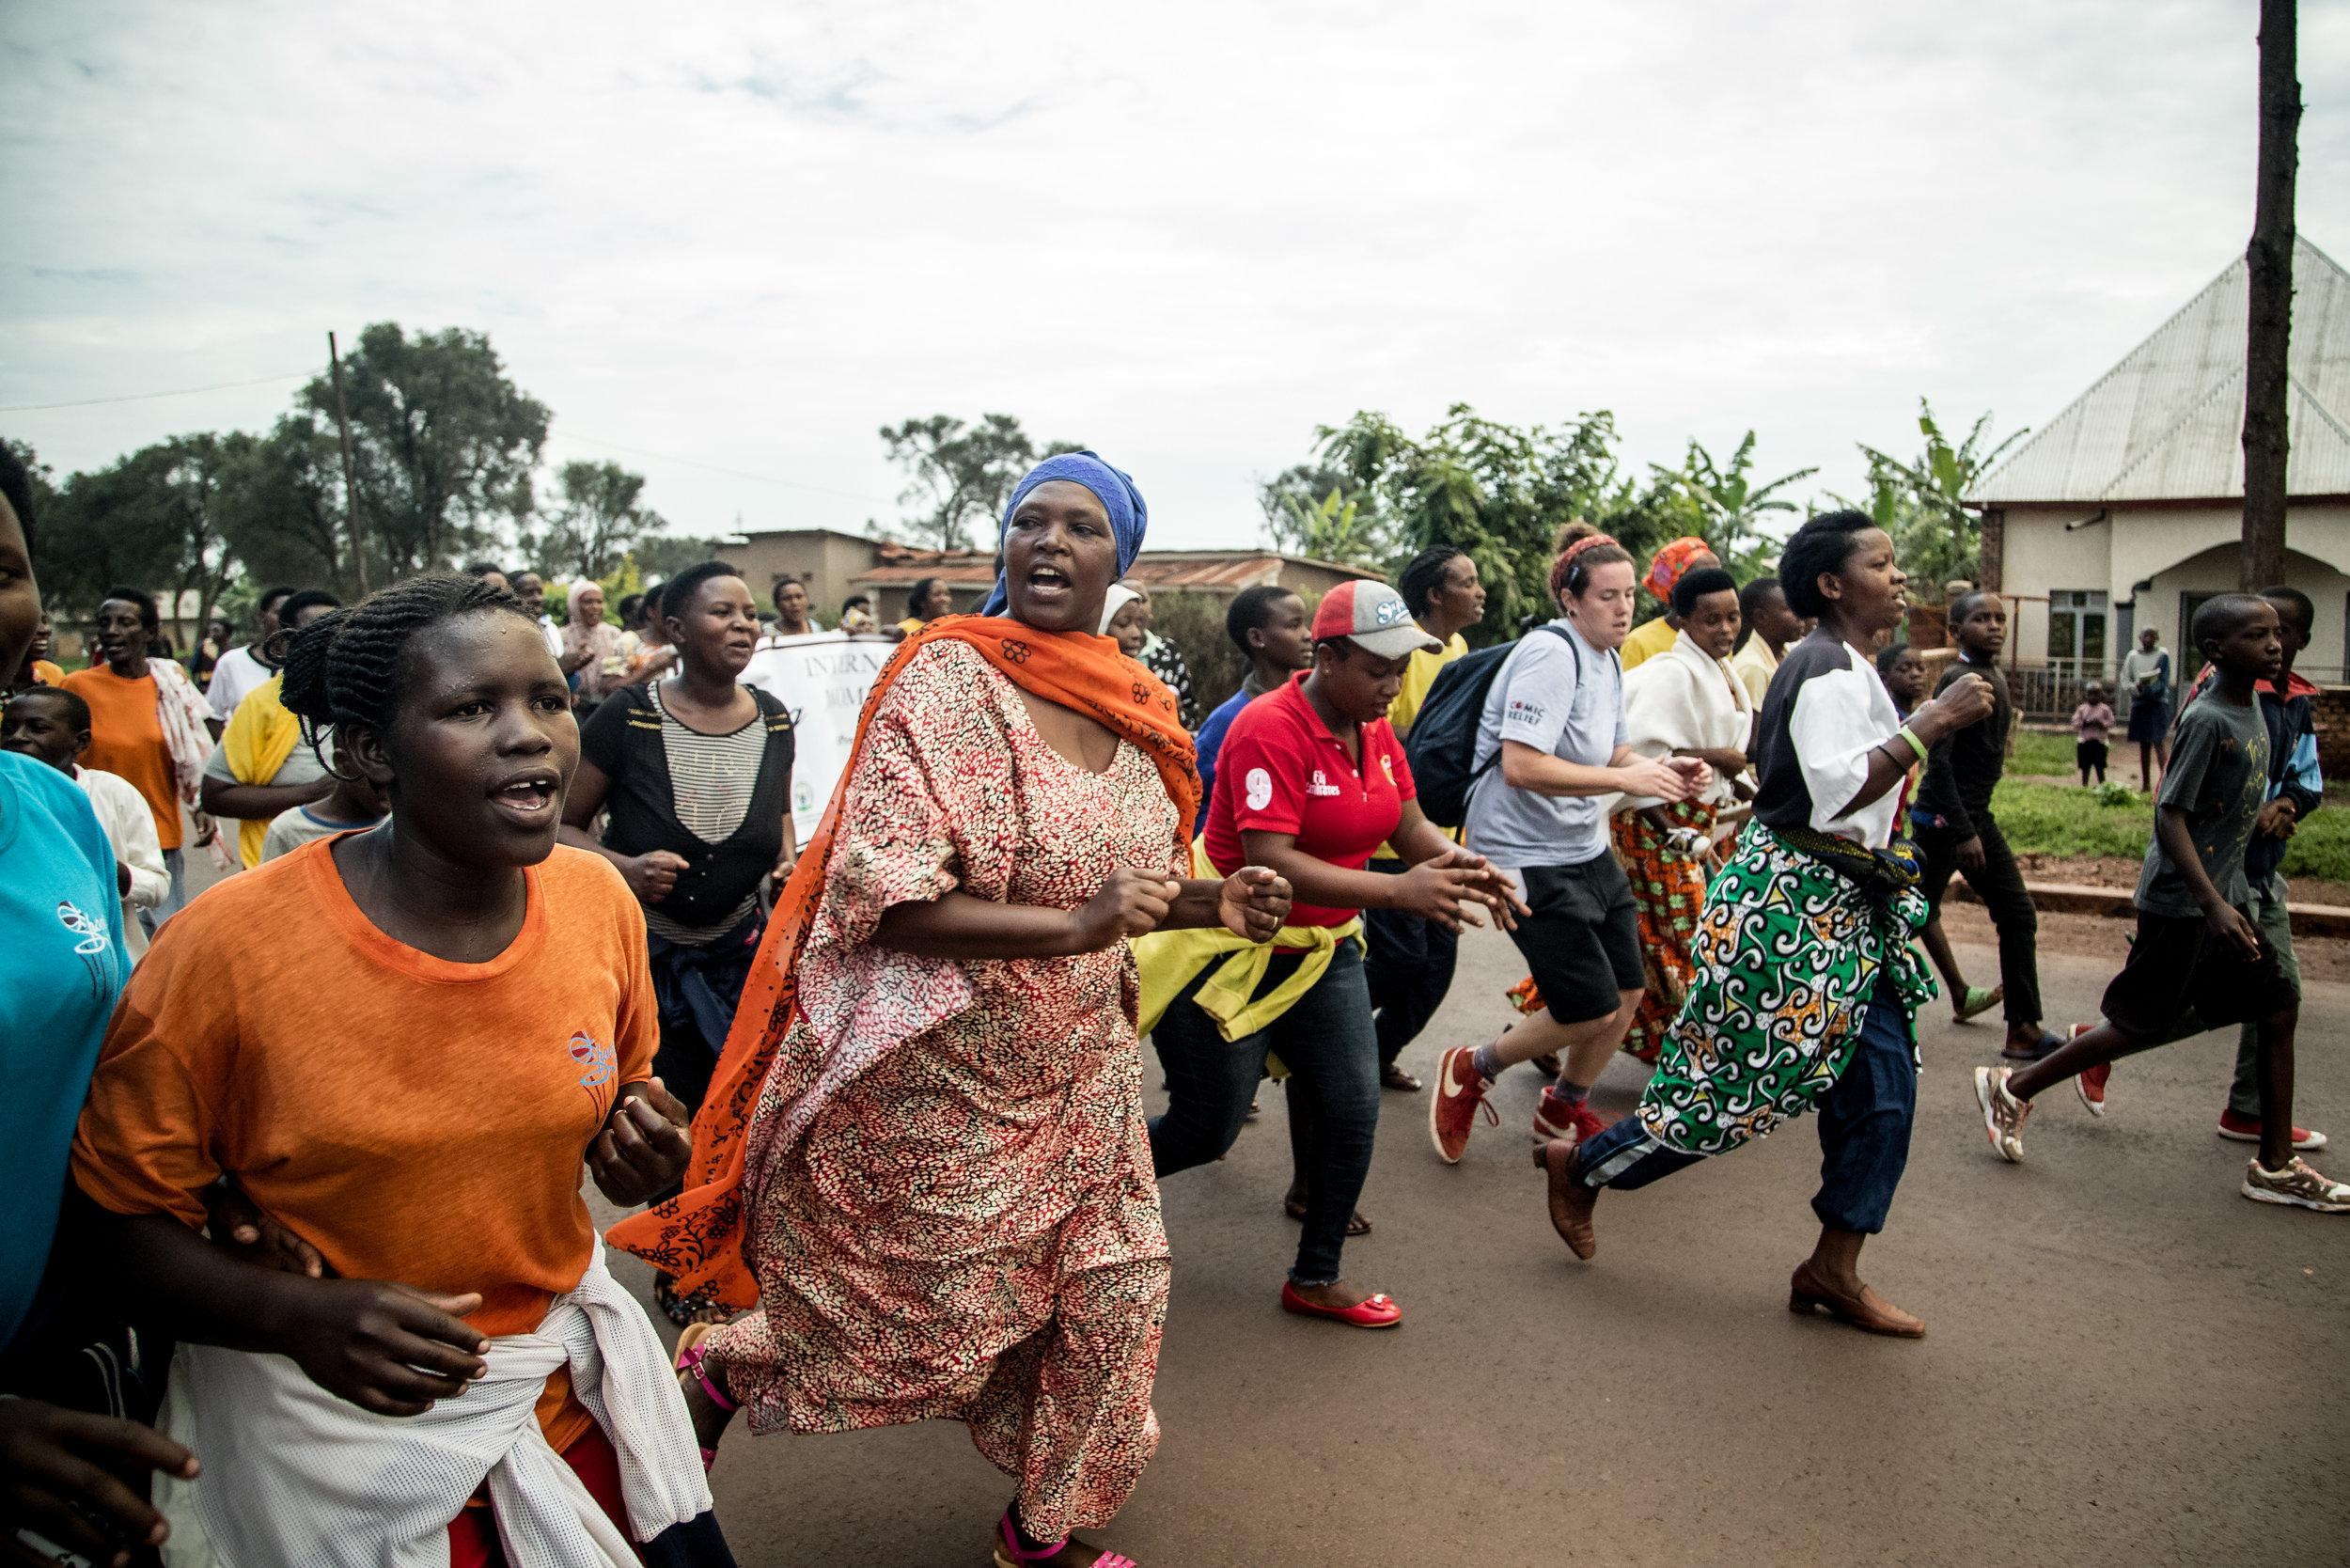 Rwanda_WomensDay_2018-2.jpg